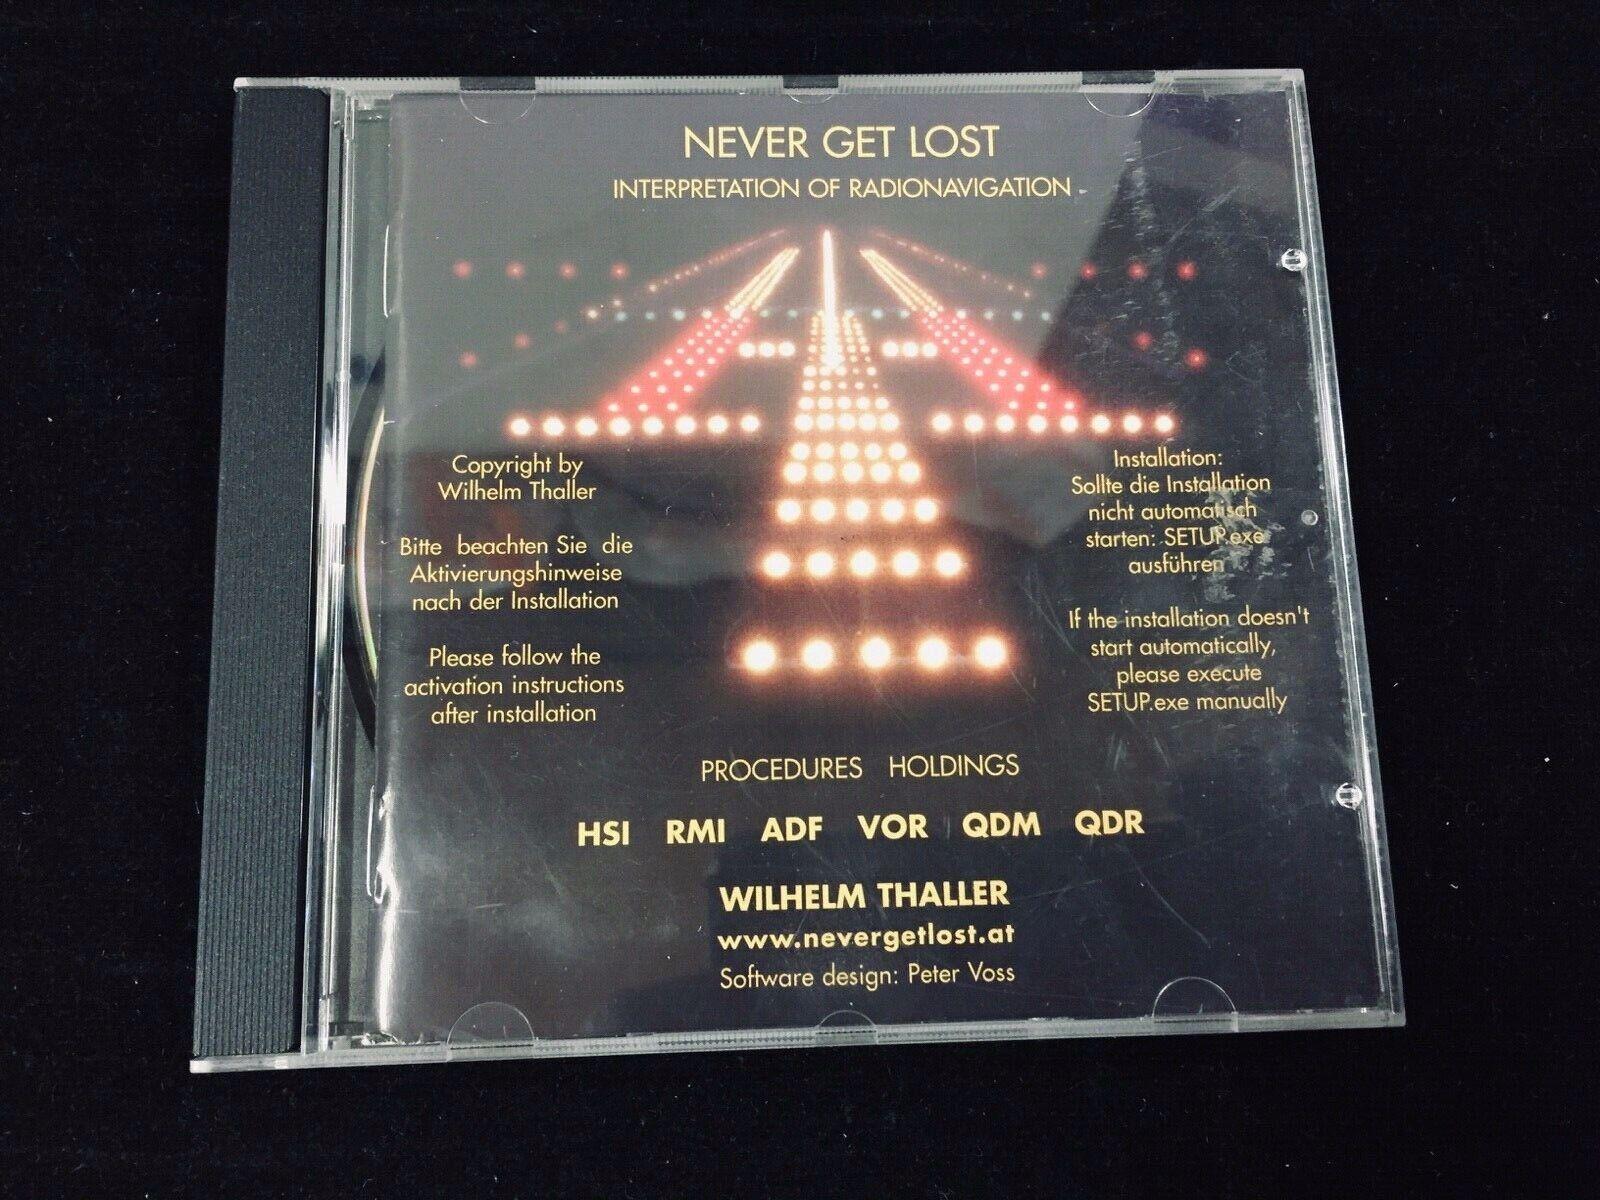 NEVER GET LOST SOFTWARE DVD, INTERPRETATION OF RADIO NAVIGATION, WILLIAM THALLER